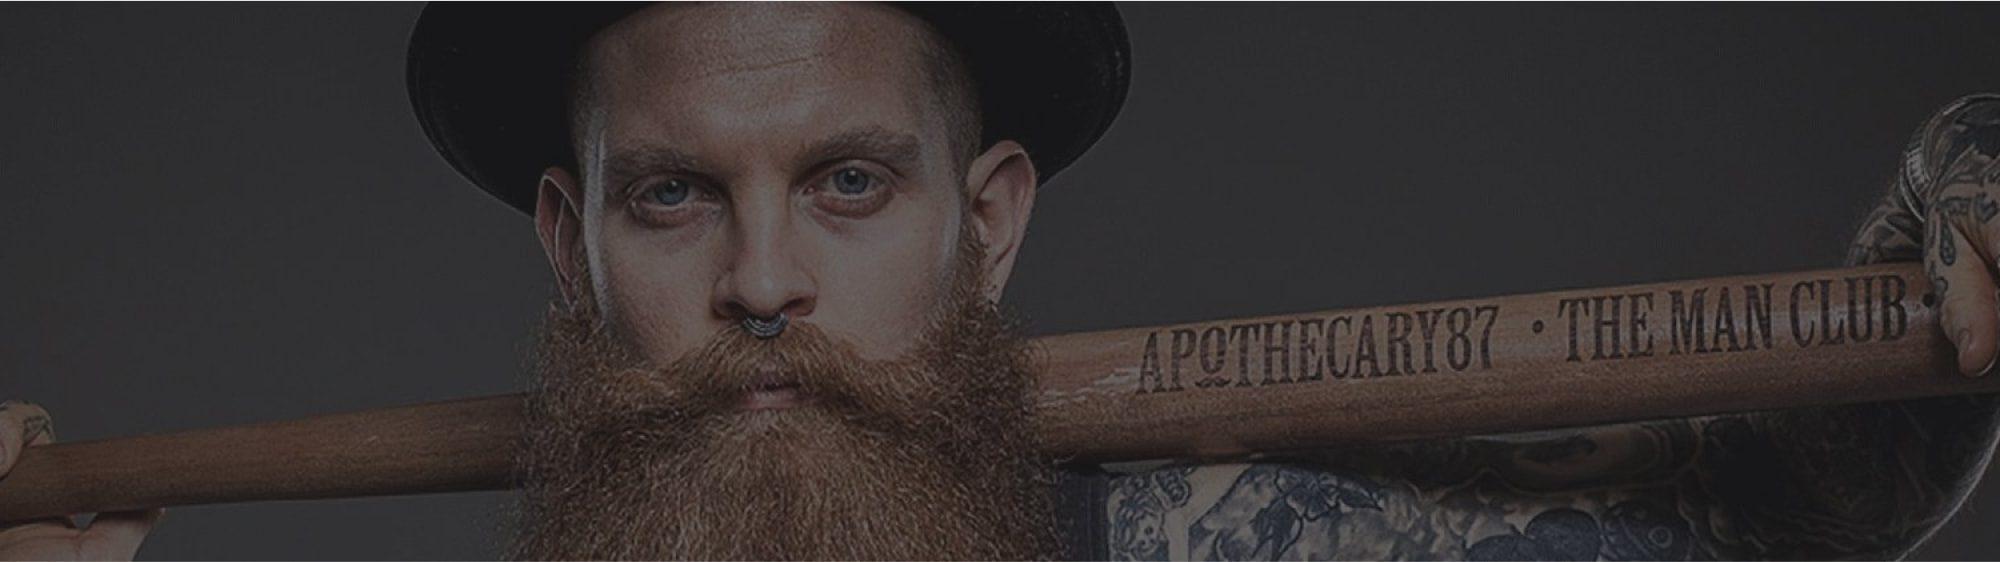 Beardshop-banner